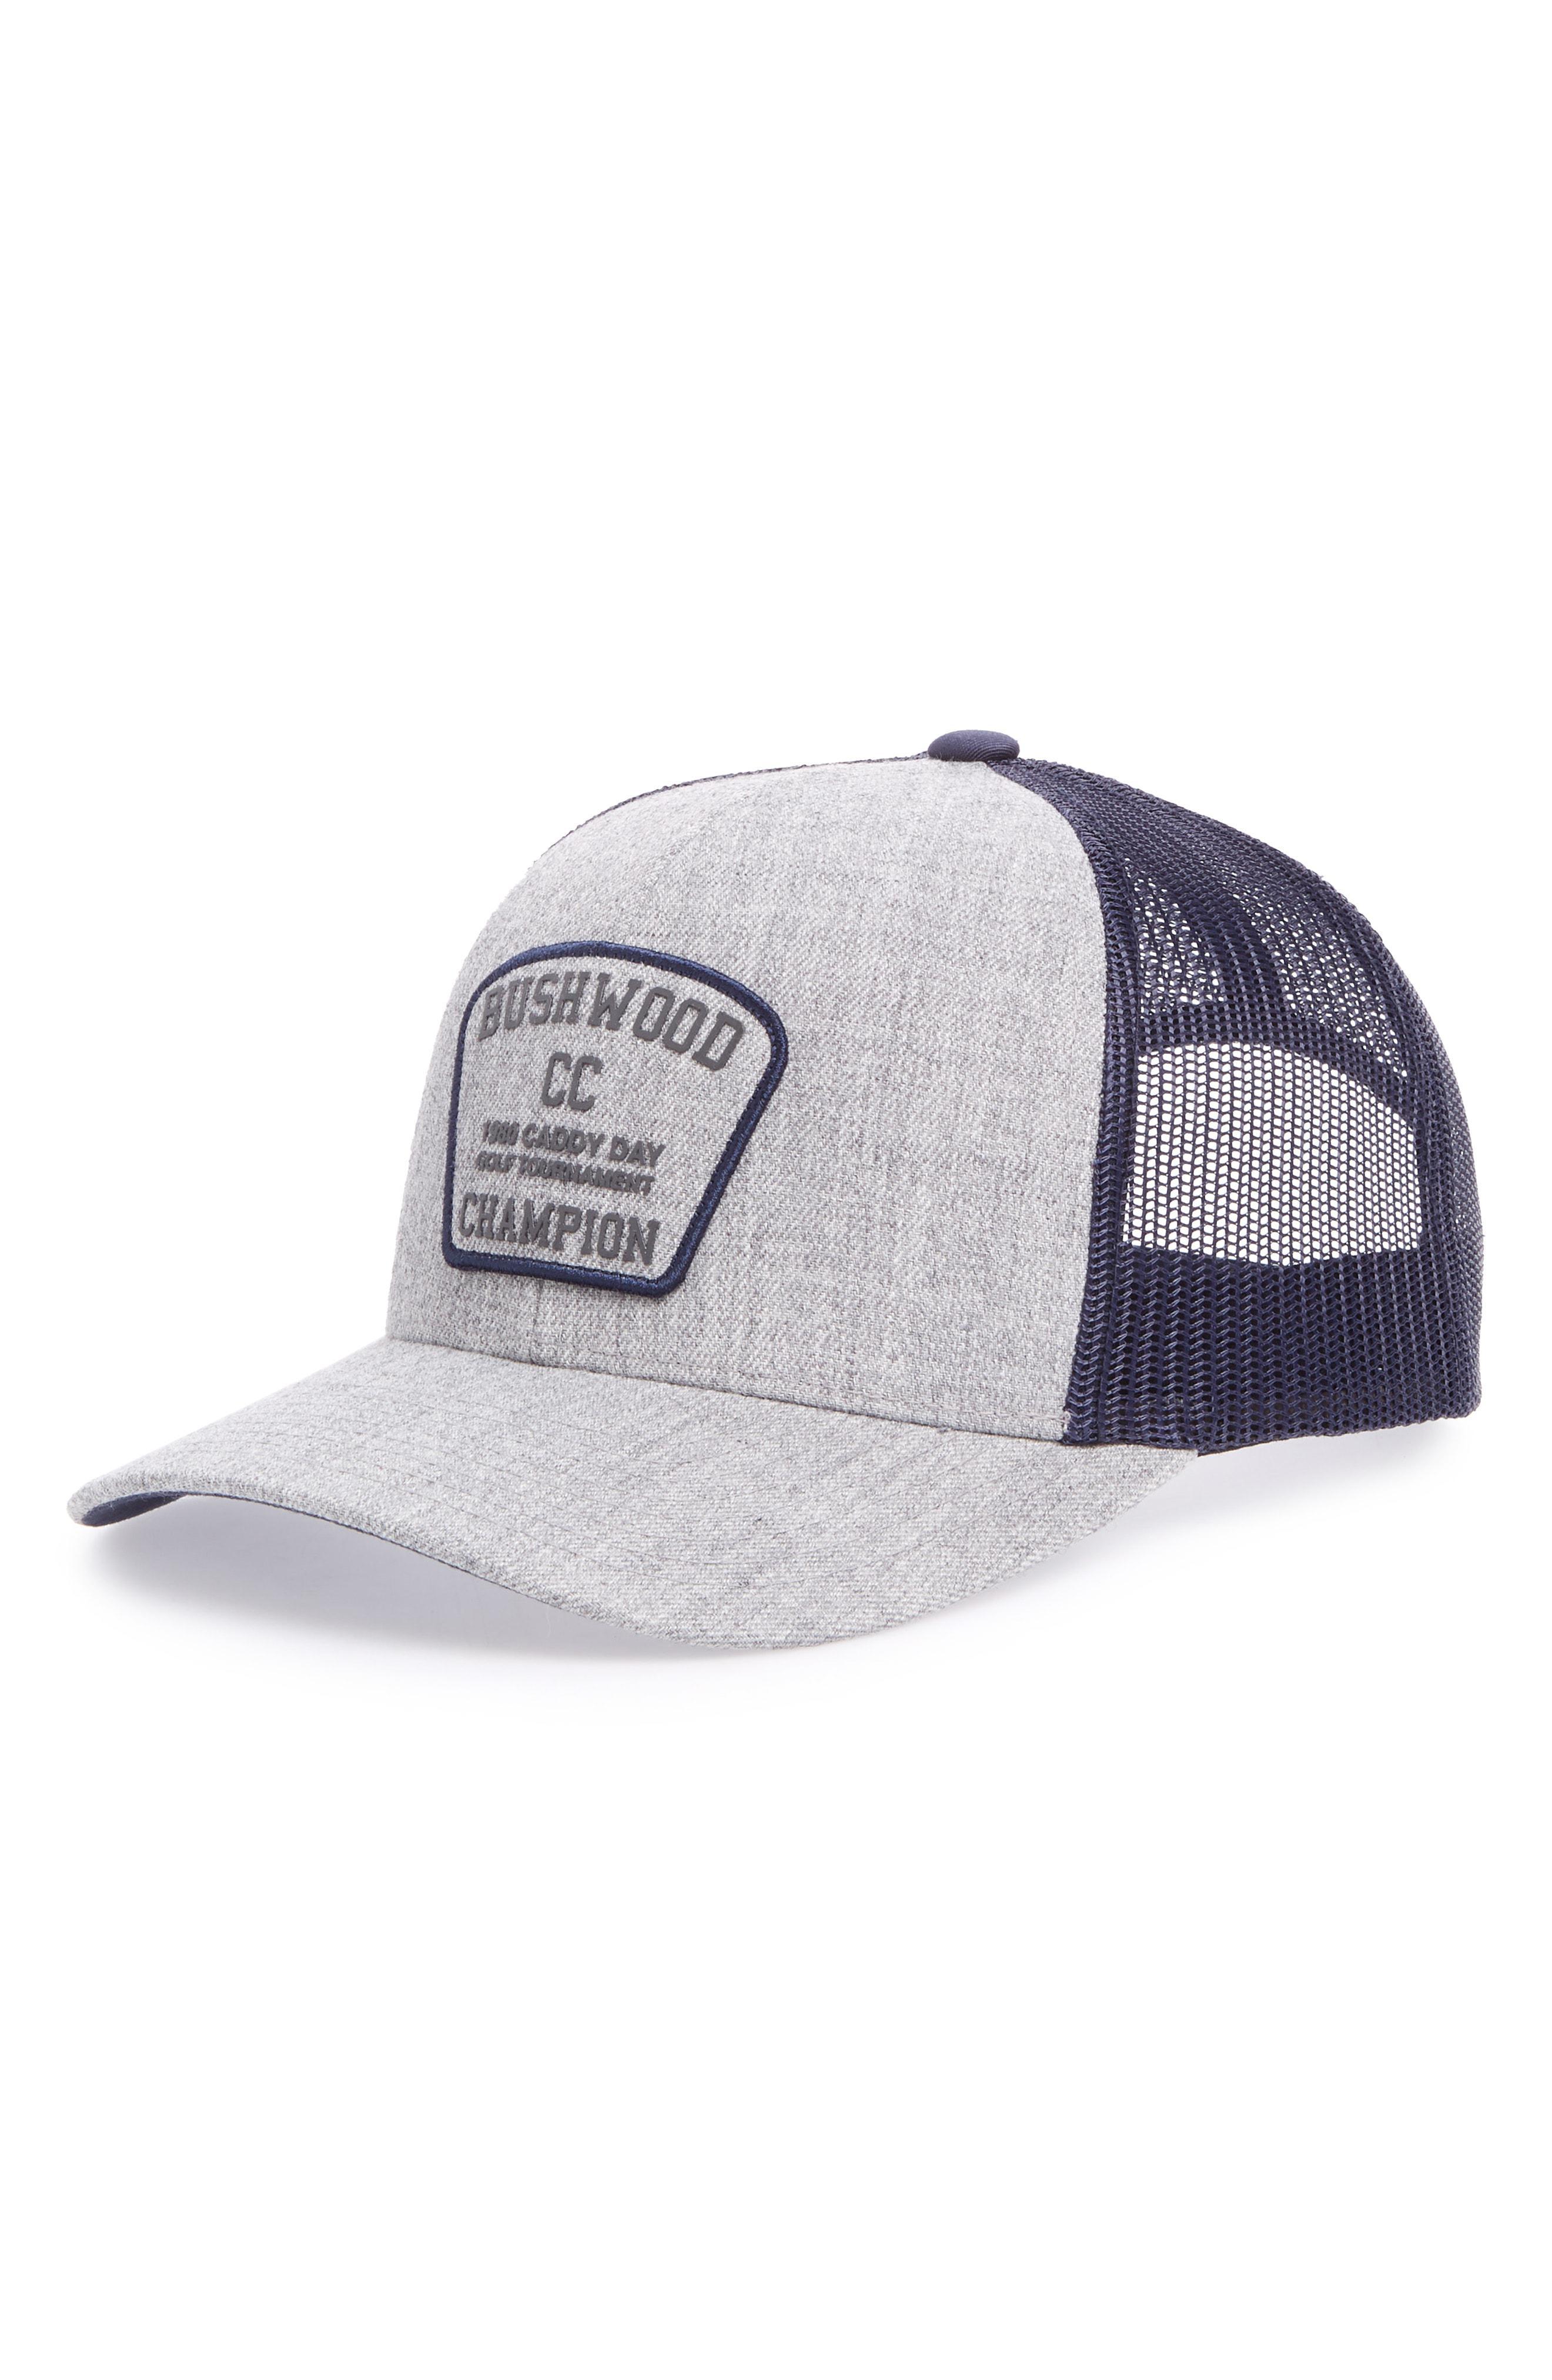 Lyst - Travis Mathew Cinderella Story Trucker Hat in Gray for Men b9a6adf93c64